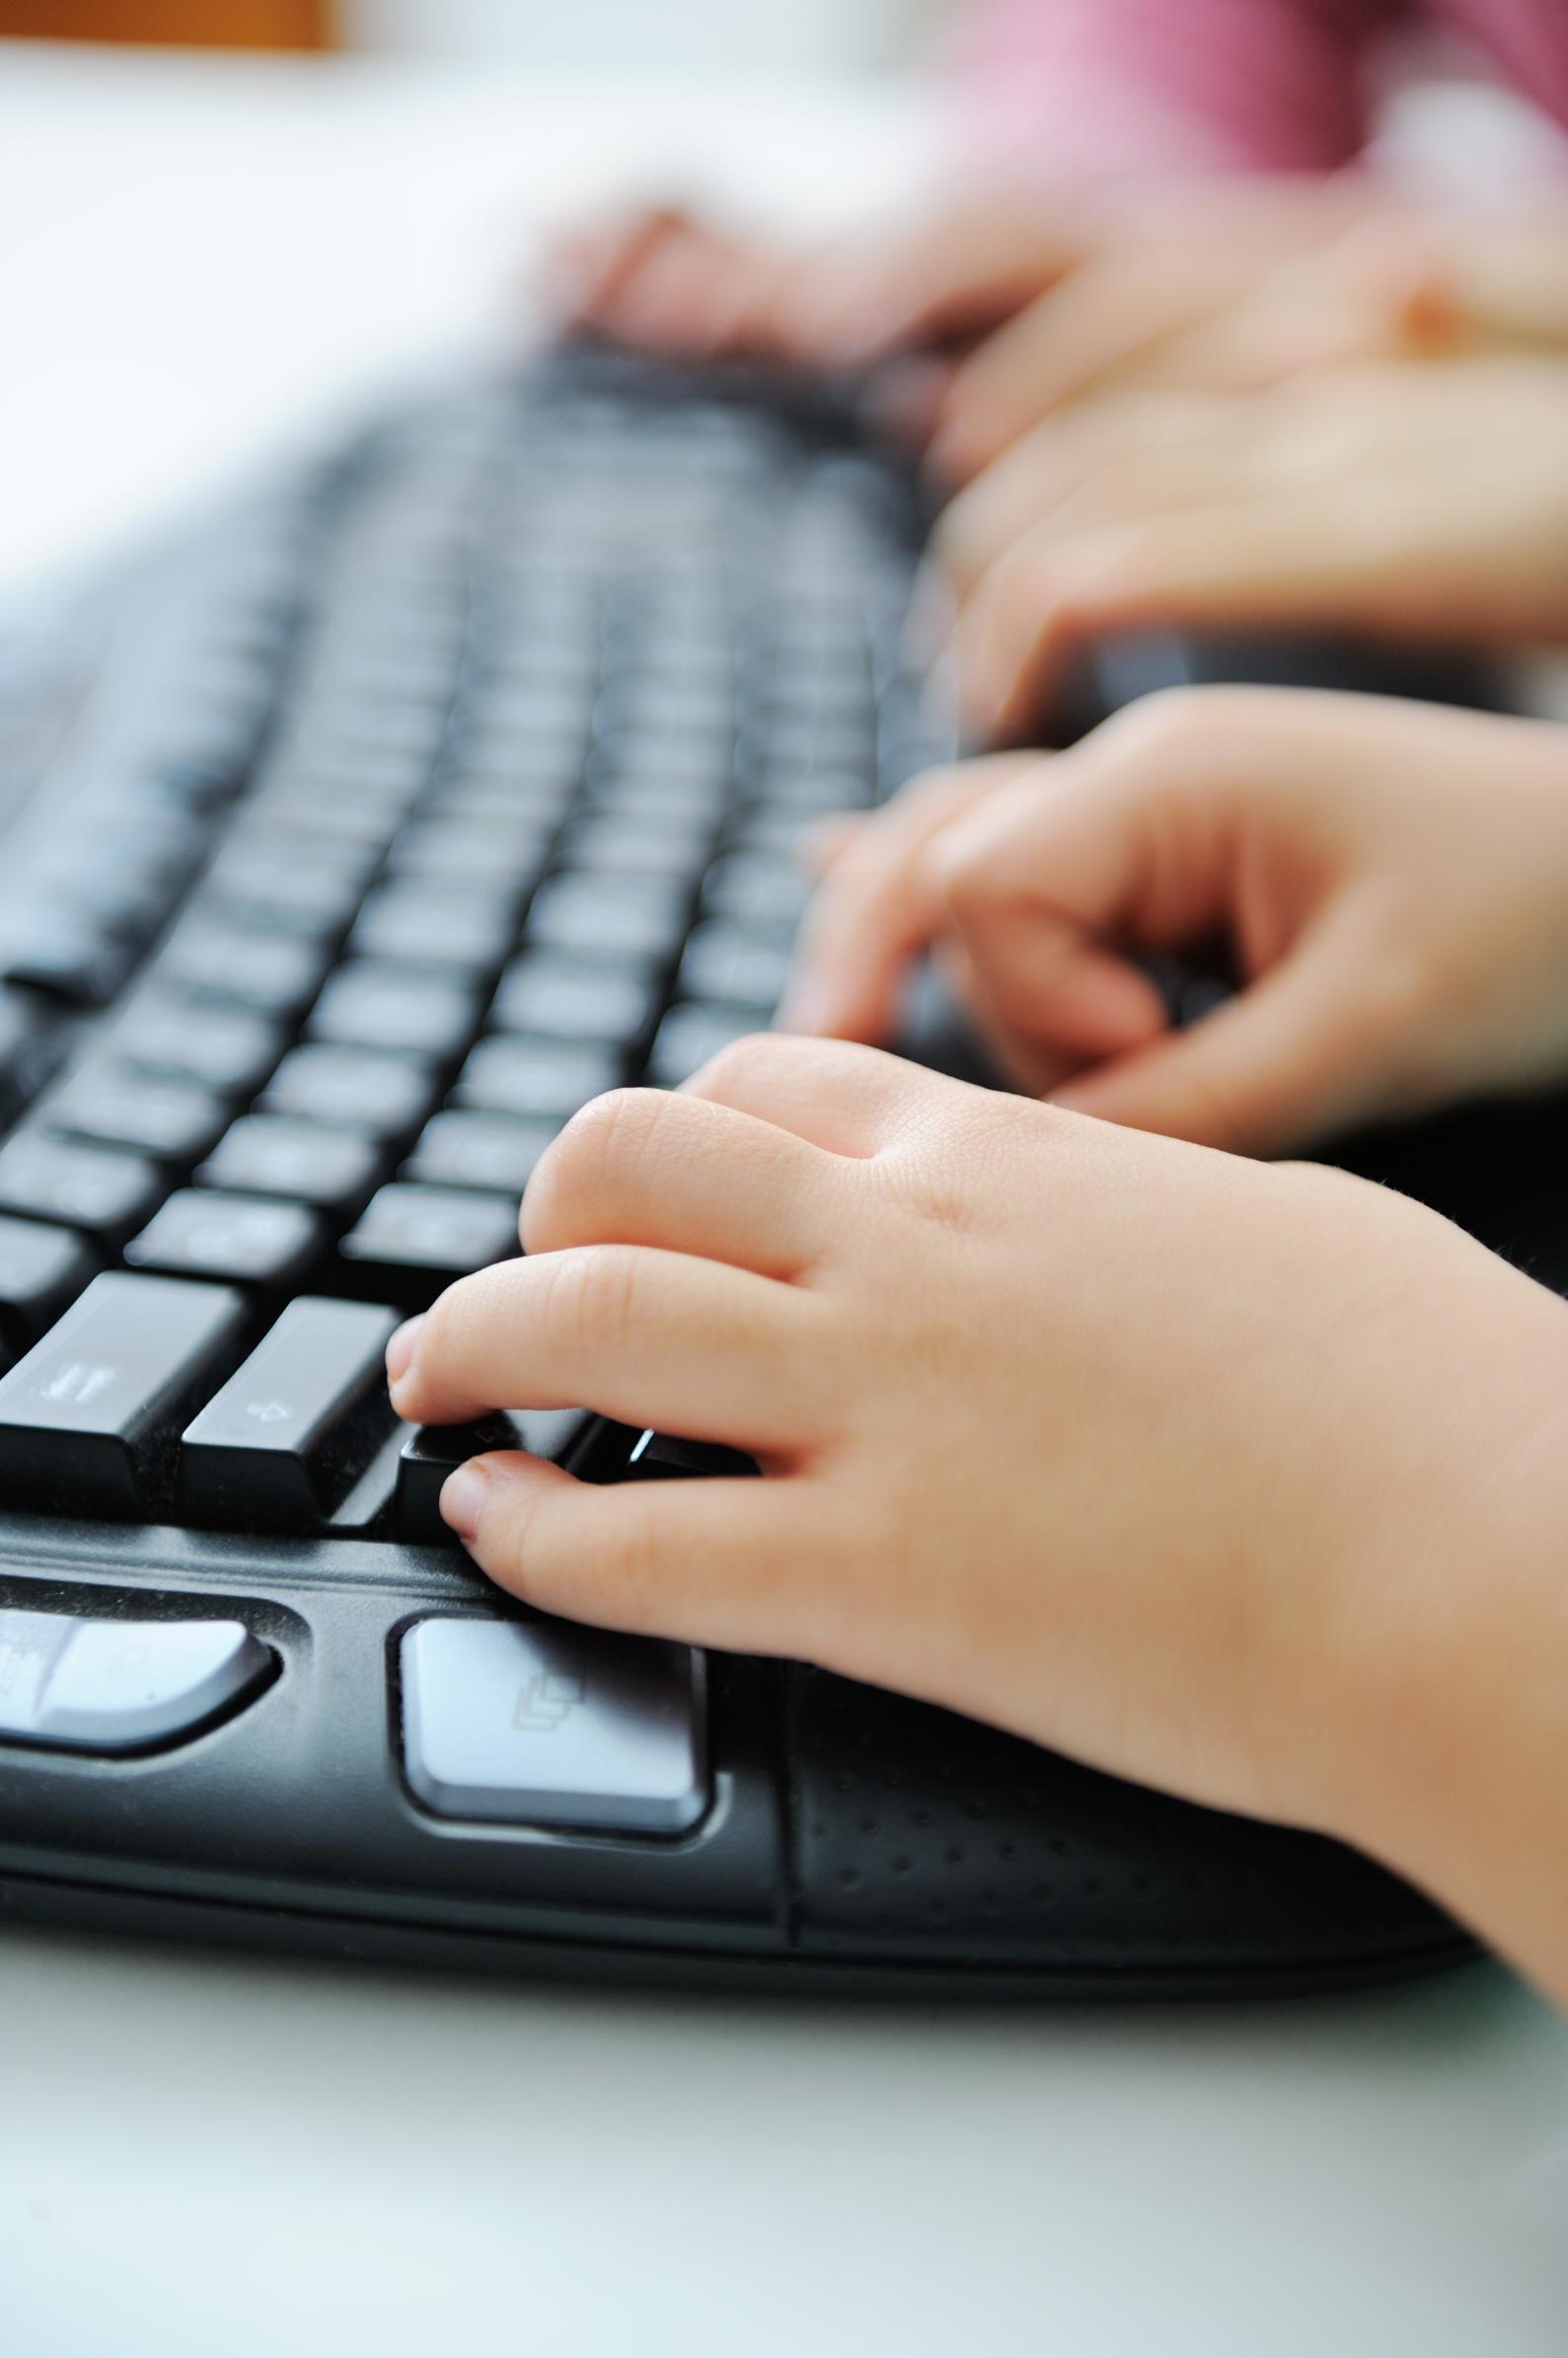 keyboarding